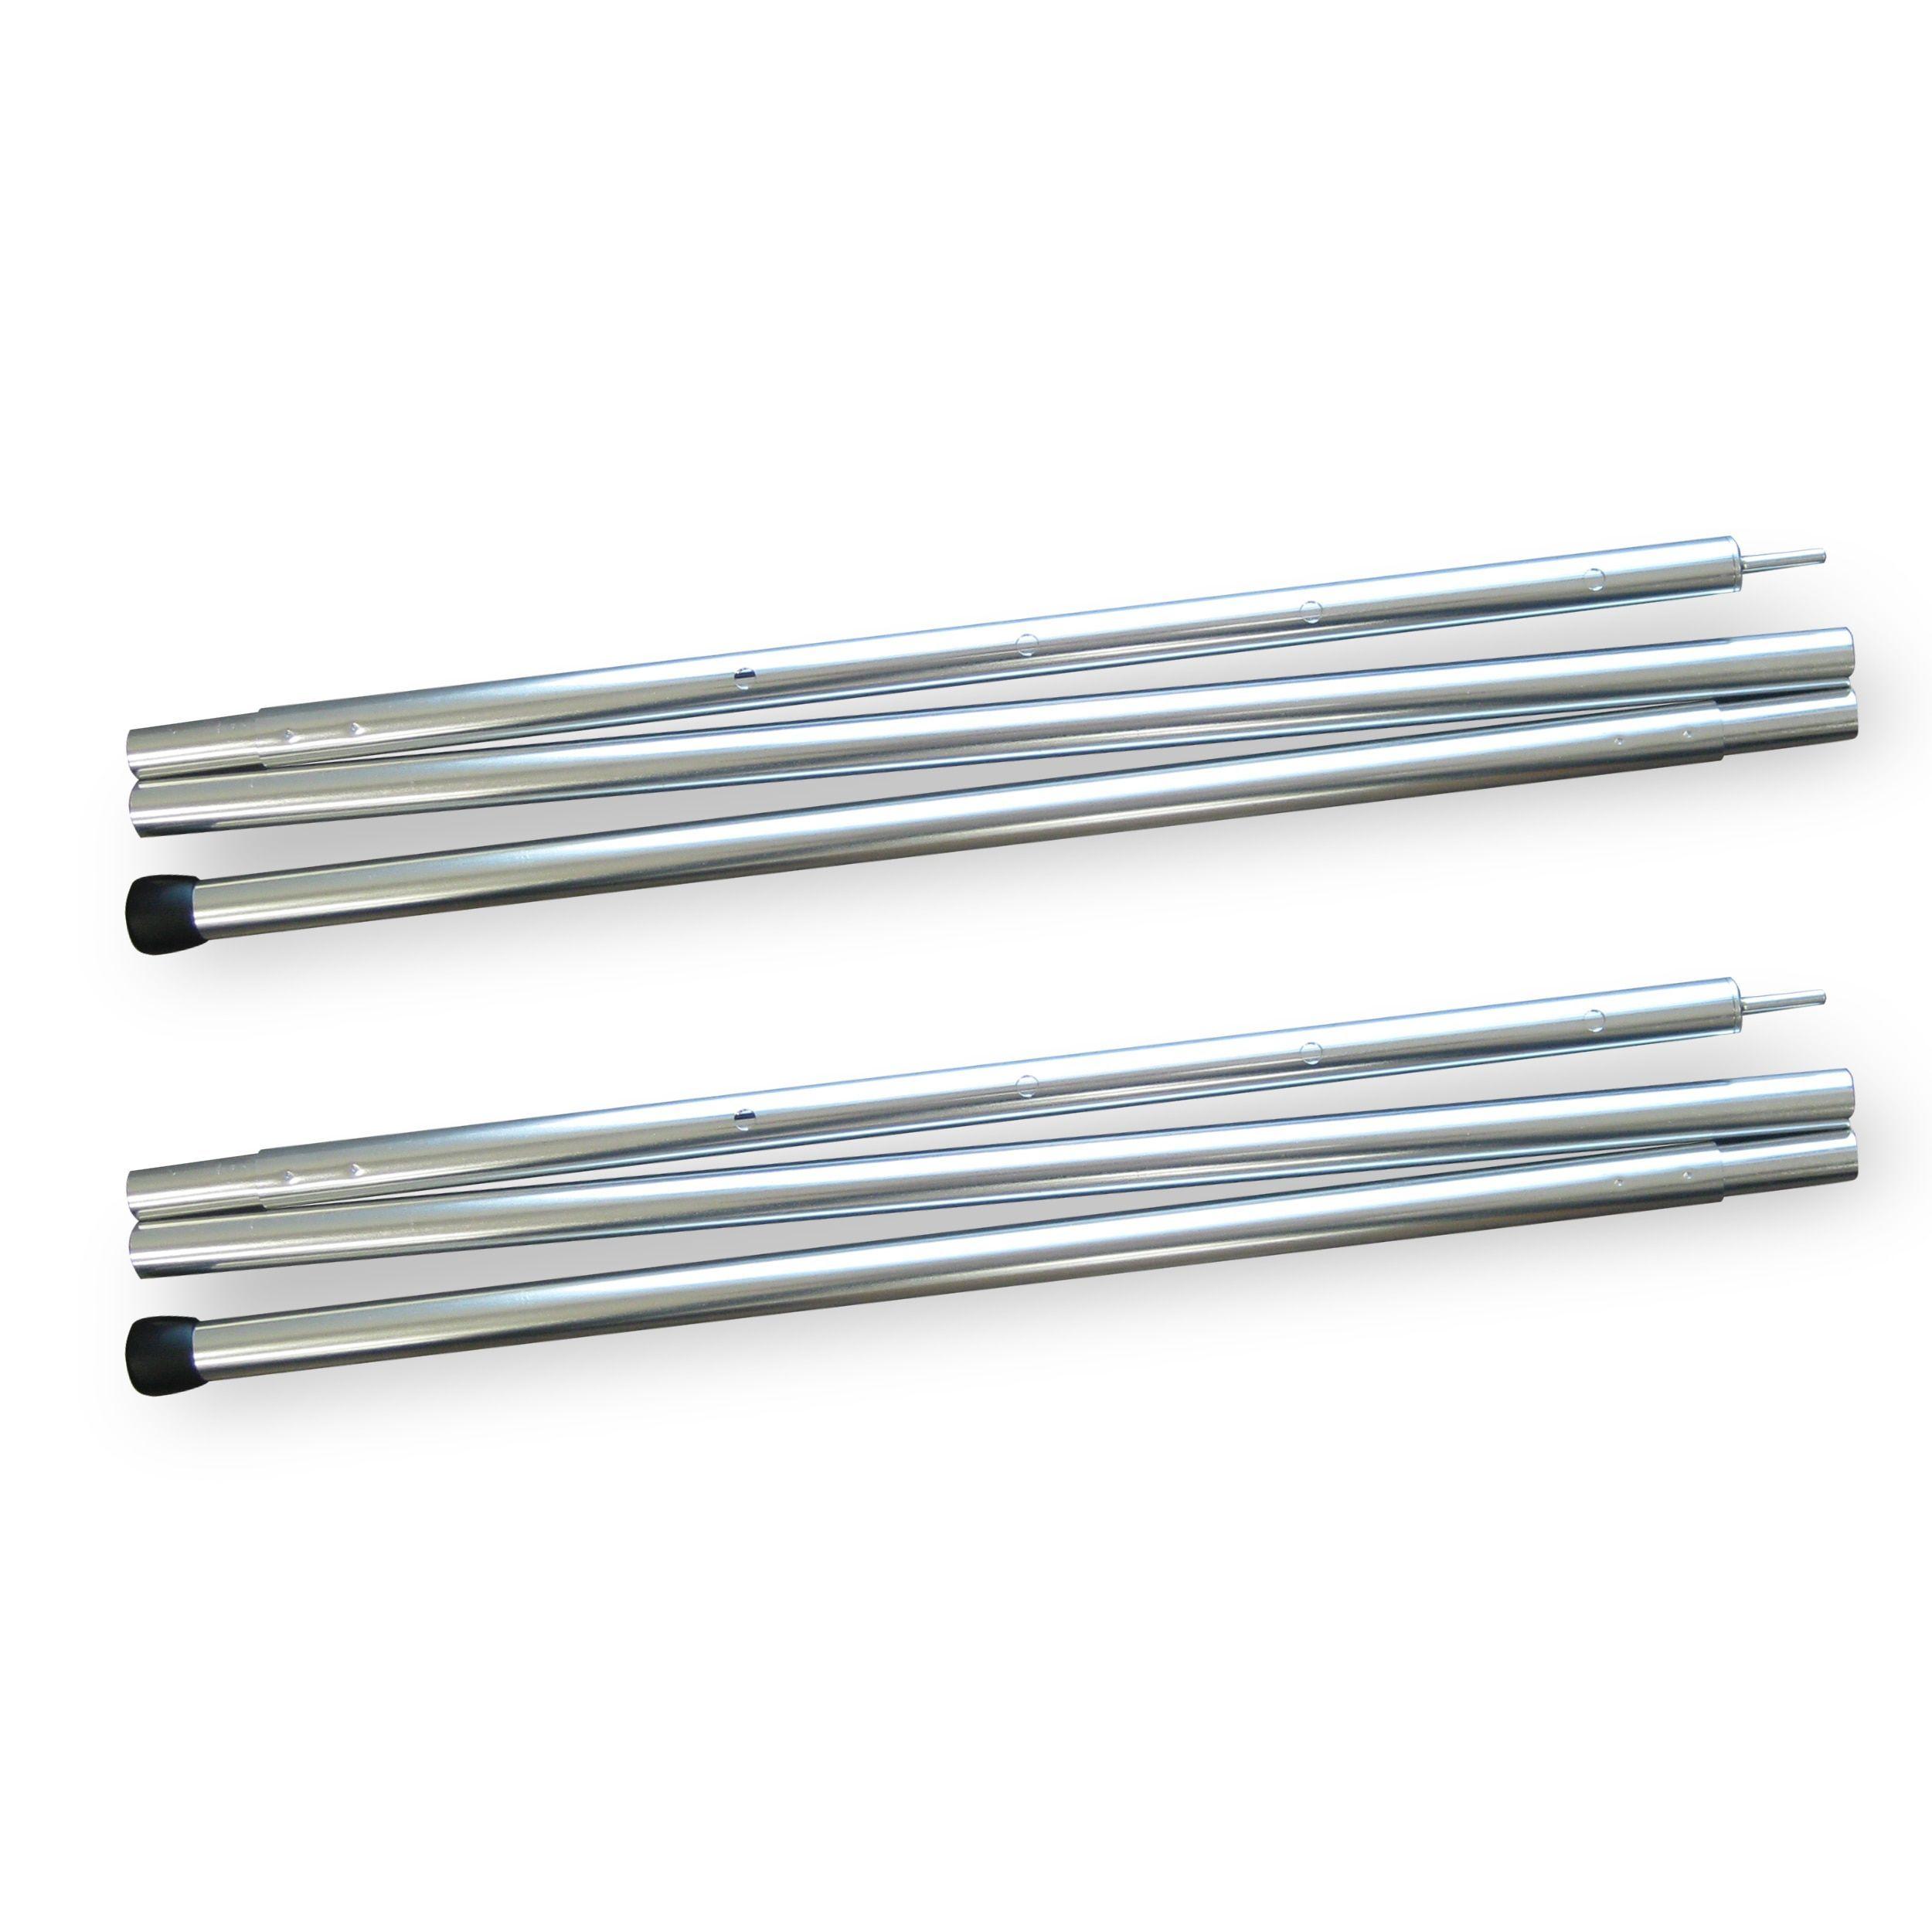 Mountainsmith Aluminum Adjustable Tarp Pole  sc 1 st  Pinterest & Mountainsmith Aluminum Adjustable Tarp Pole | Products | Pinterest ...